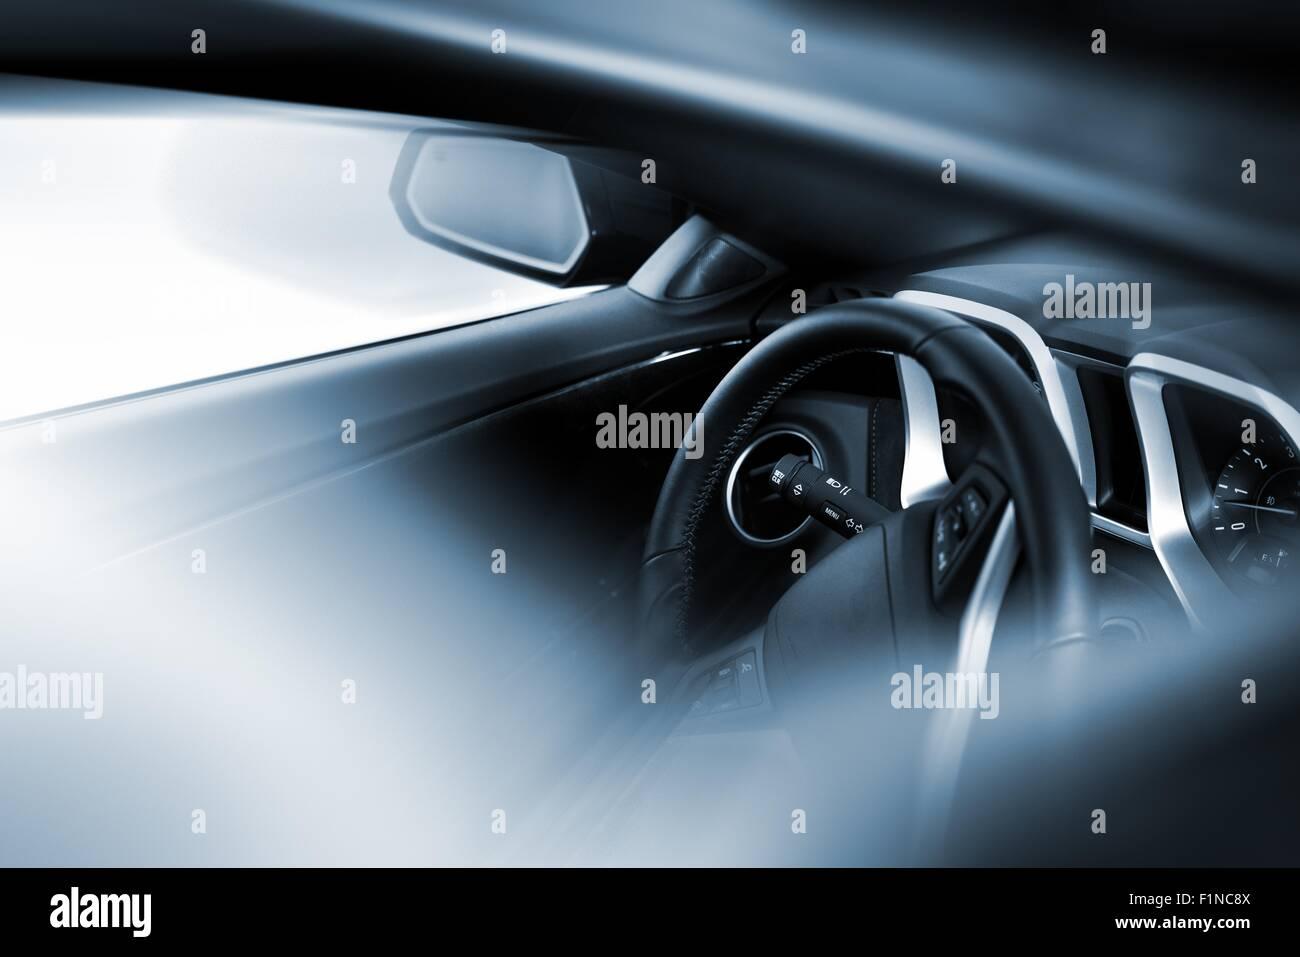 Car Driving Theme Modern Car Cockpit Photo Taken Through Sunroof Stock Photo Alamy